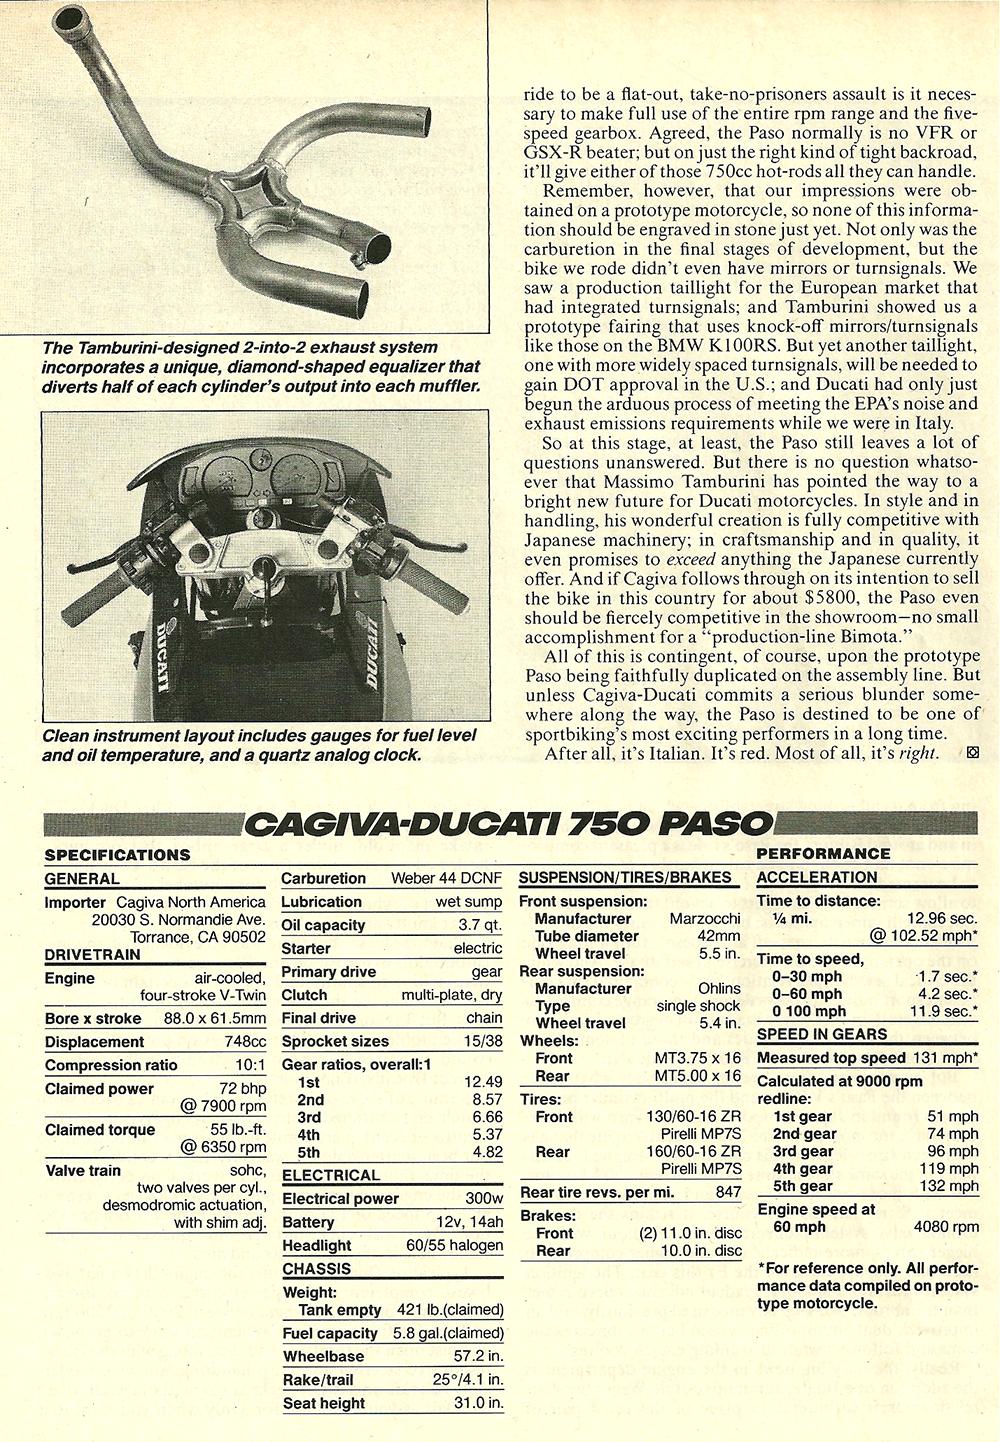 1986 Cagiva-Ducati 750 Paso road test 09.jpg